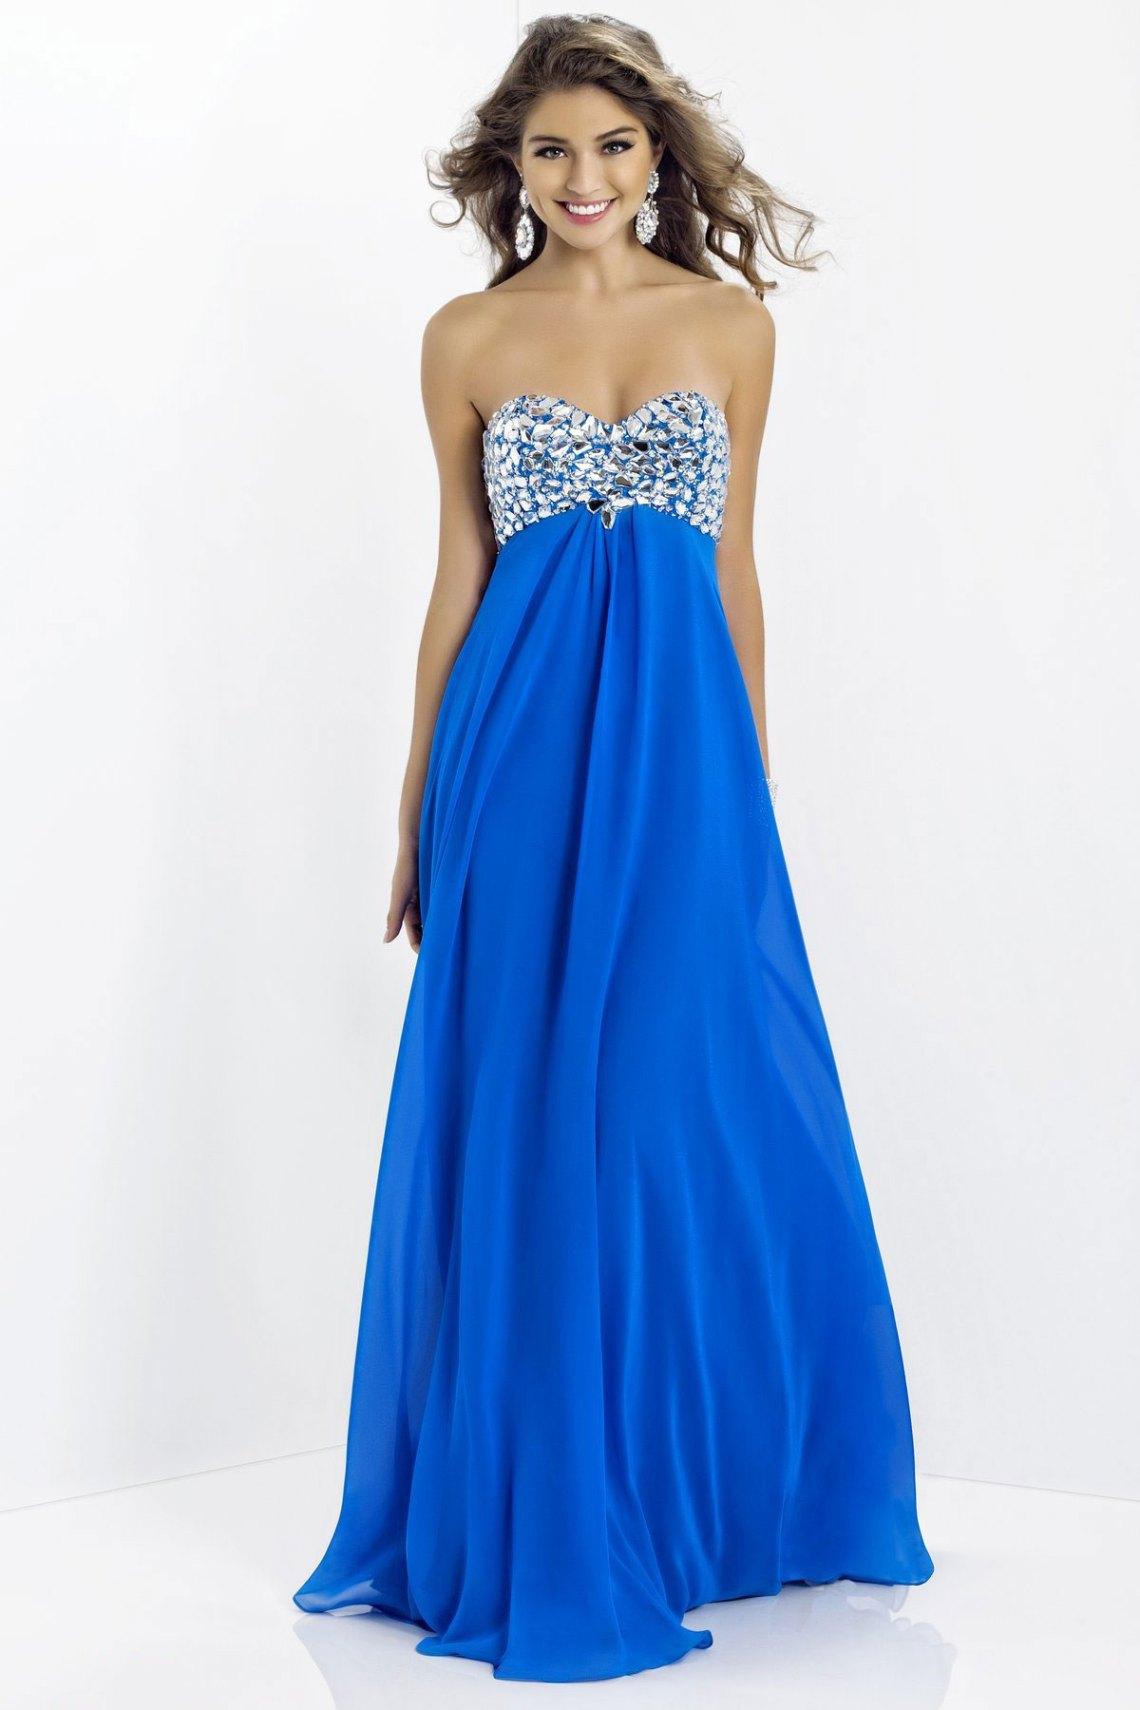 aisle style dresses (6)